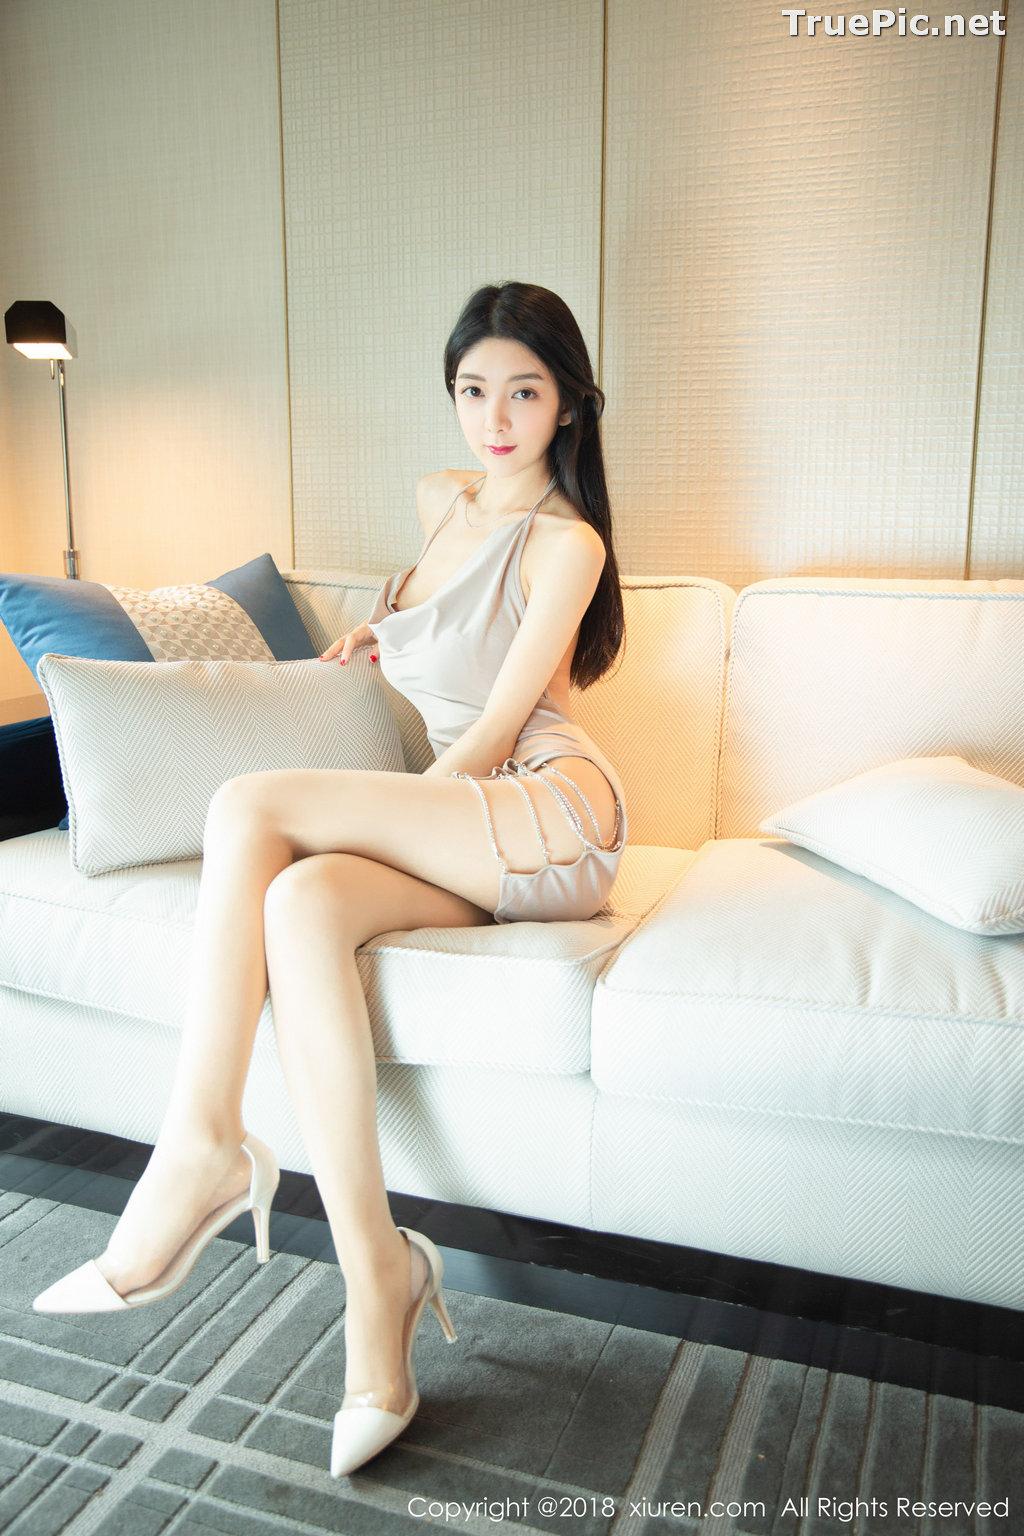 Image XIUREN No.1141 - Chinese Model - Xiao Reba (Angela小热巴) - Sexy Dress Tonight - TruePic.net - Picture-17